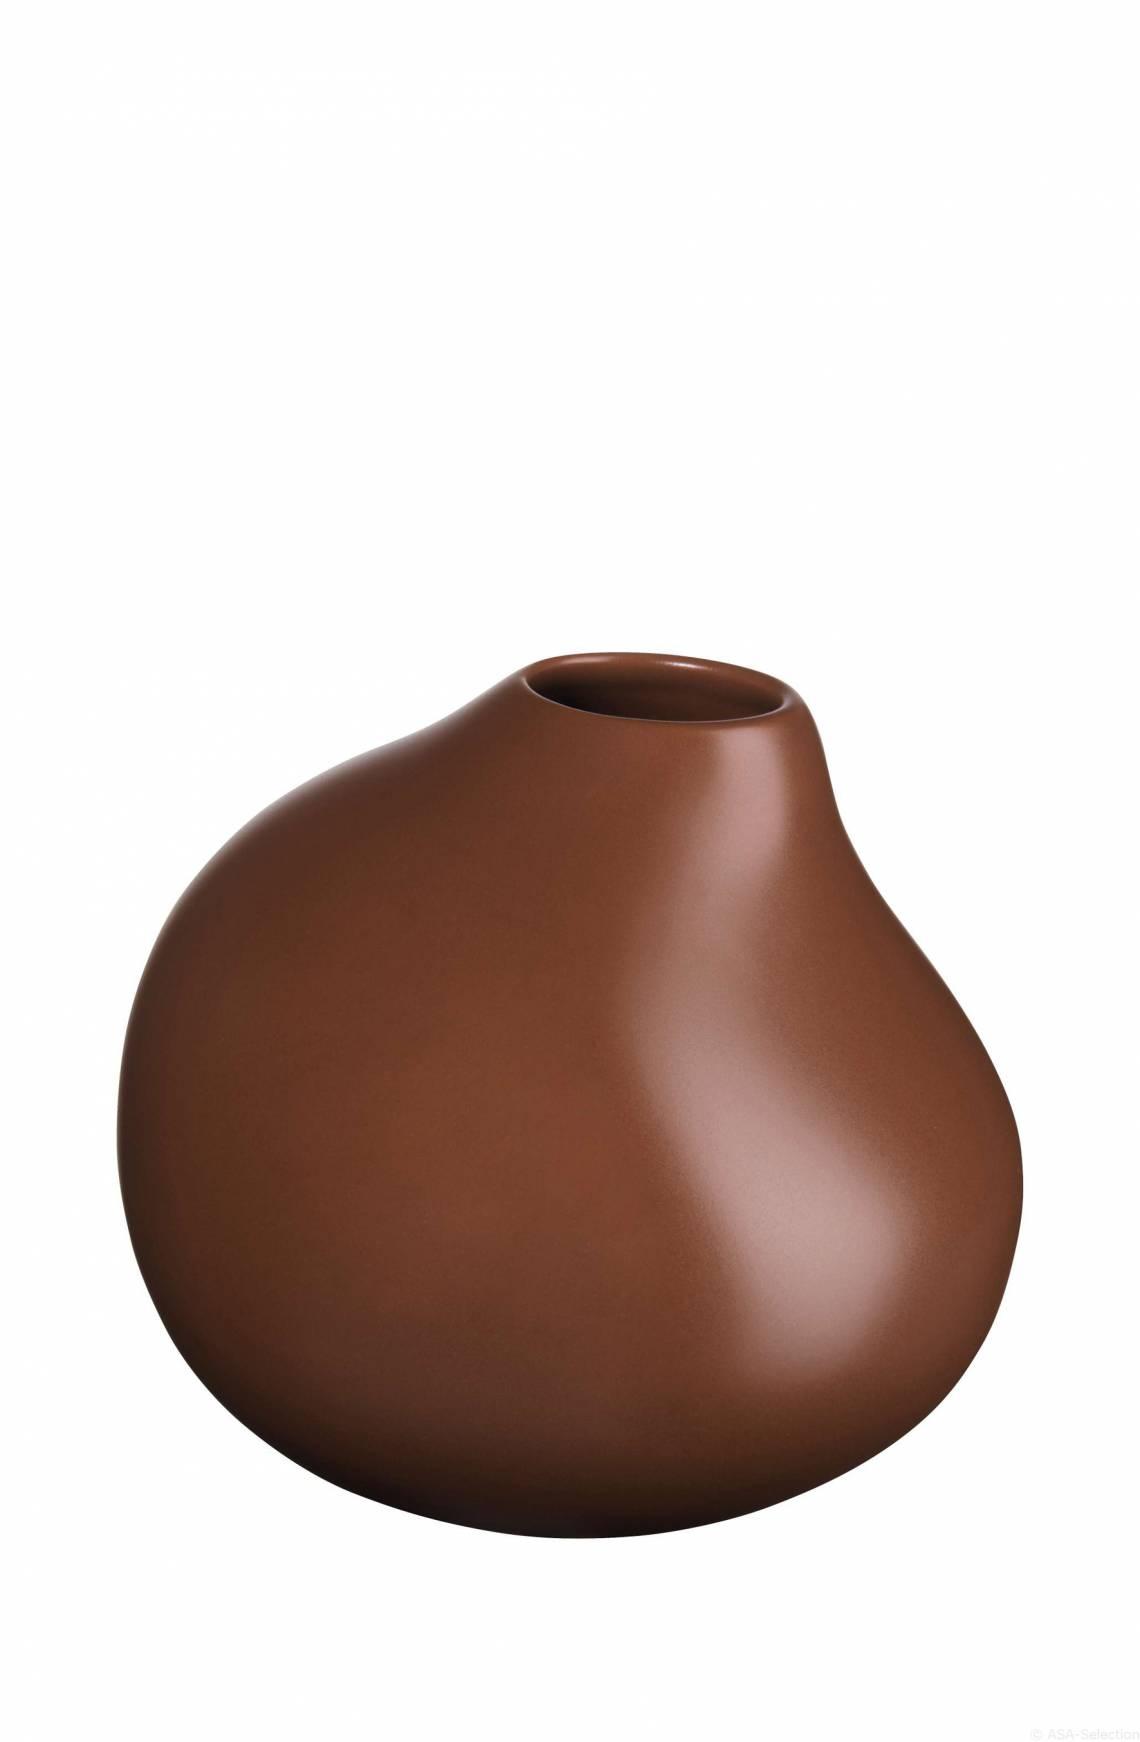 ASA - Calabash Vase 9268153